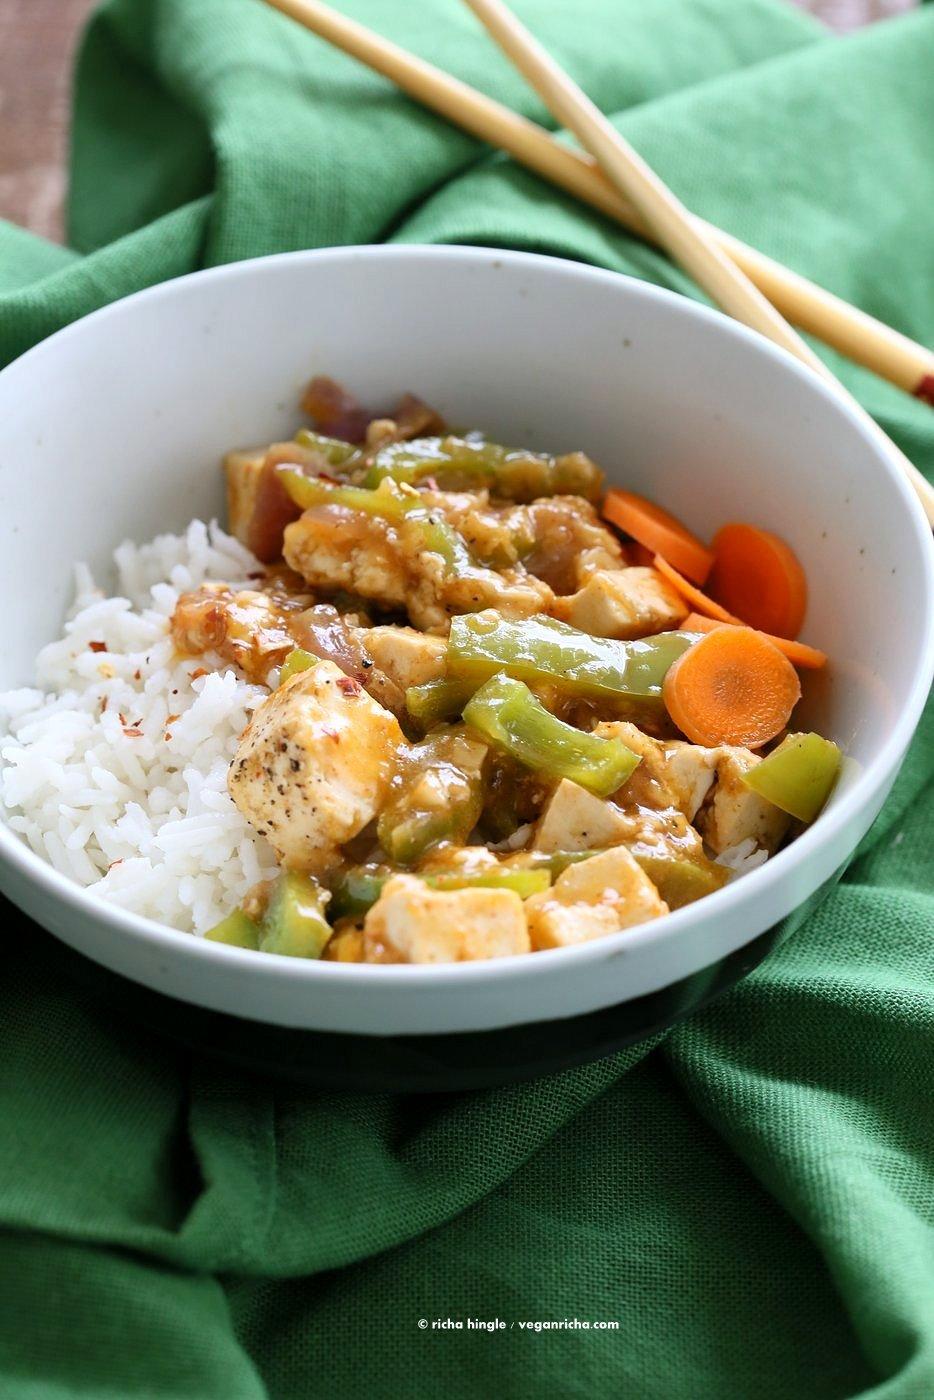 Chilli tofu indian chilli paneer recipe vegan richa chilli tofu indian chilli paneer recipe chilli paneer is an indo forumfinder Choice Image